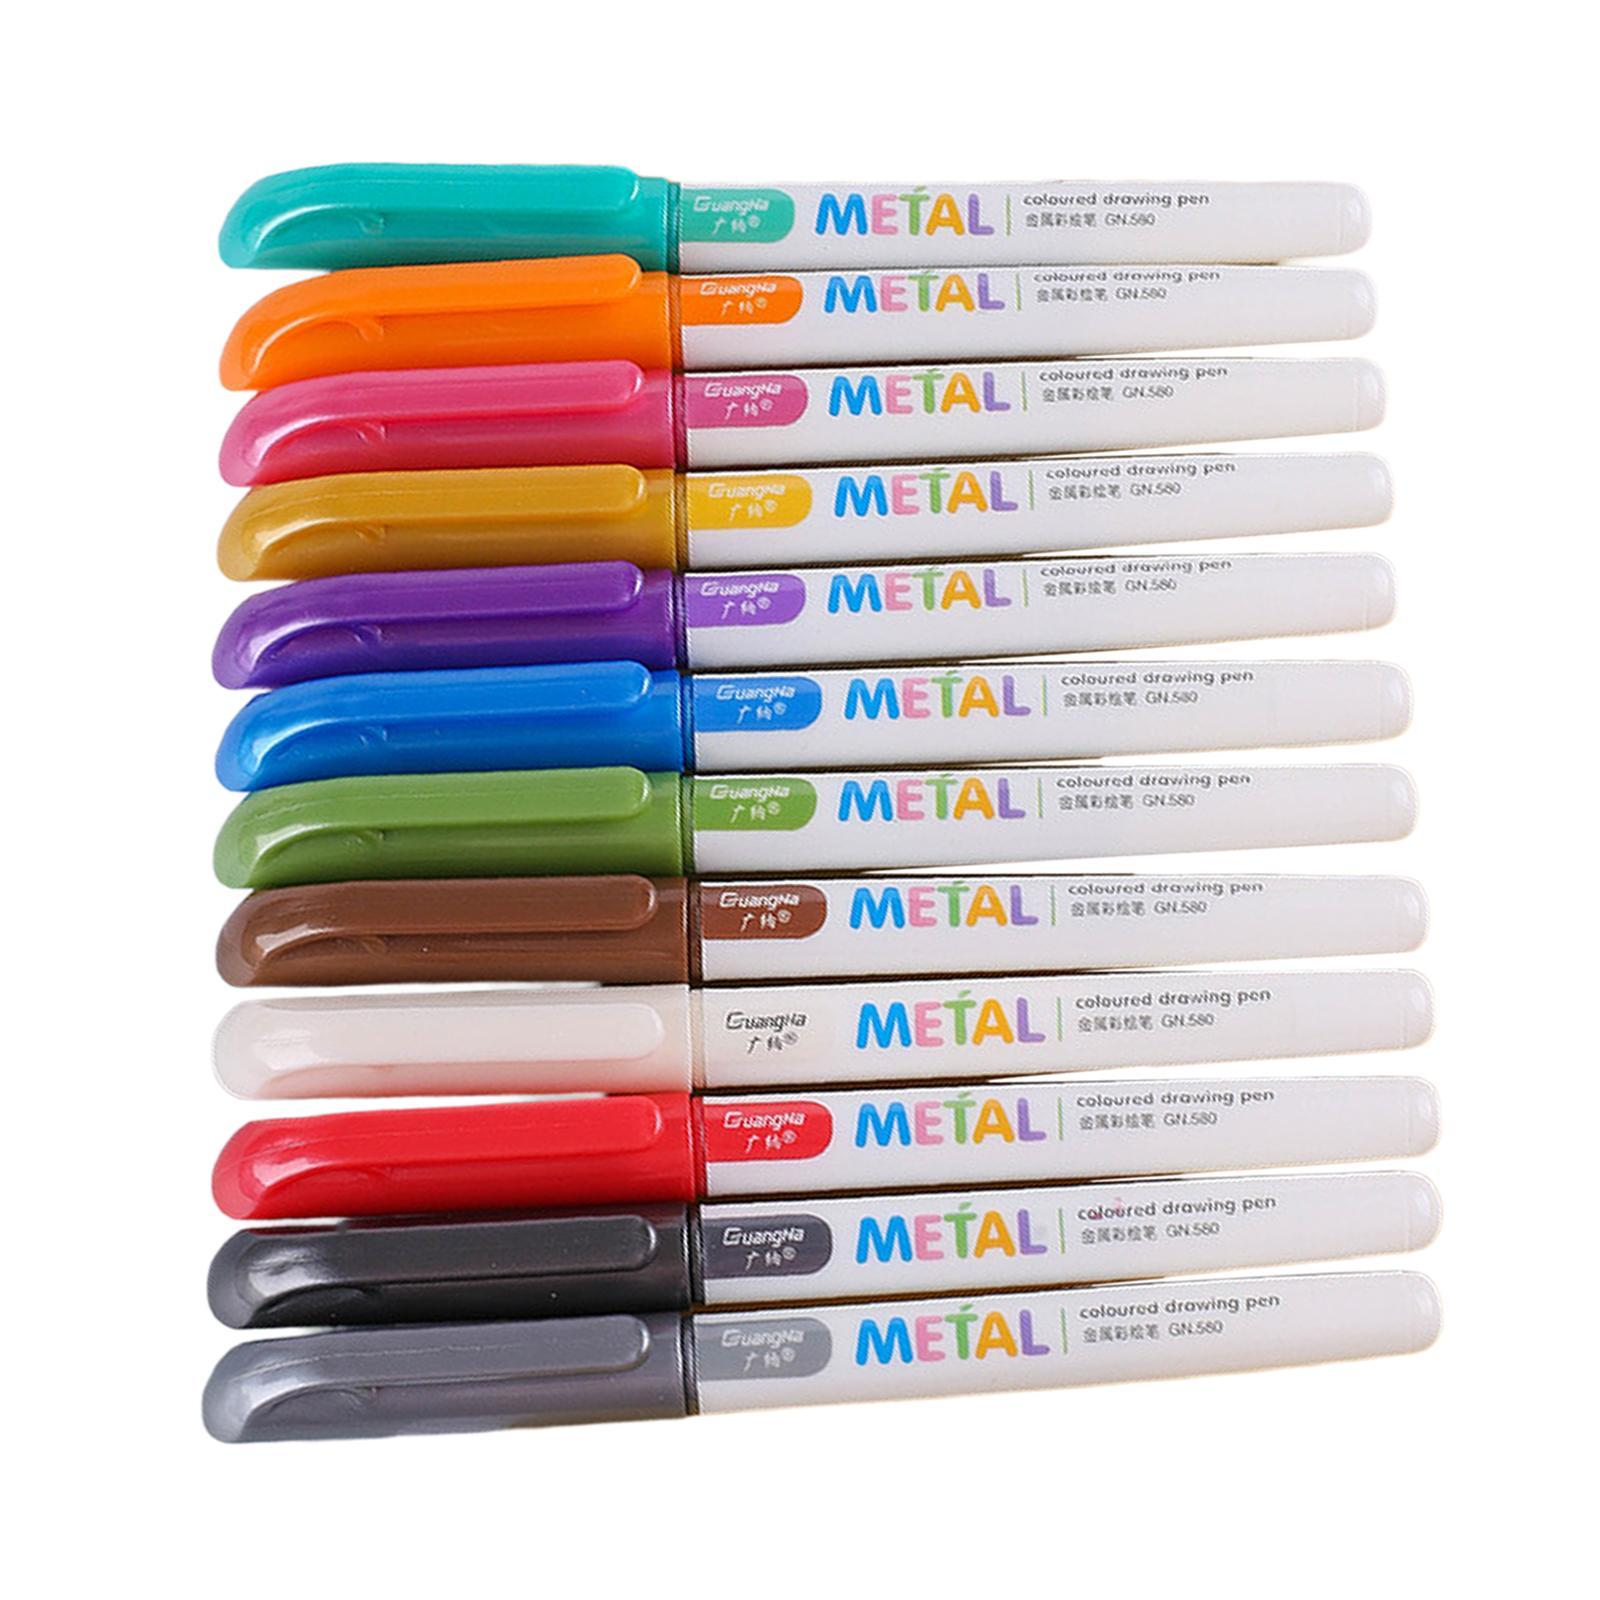 miniatura 14 - 8-12-20x-Permanente-Metallic-Marcatori-Vernici-Penne-per-Adulti-Colouring